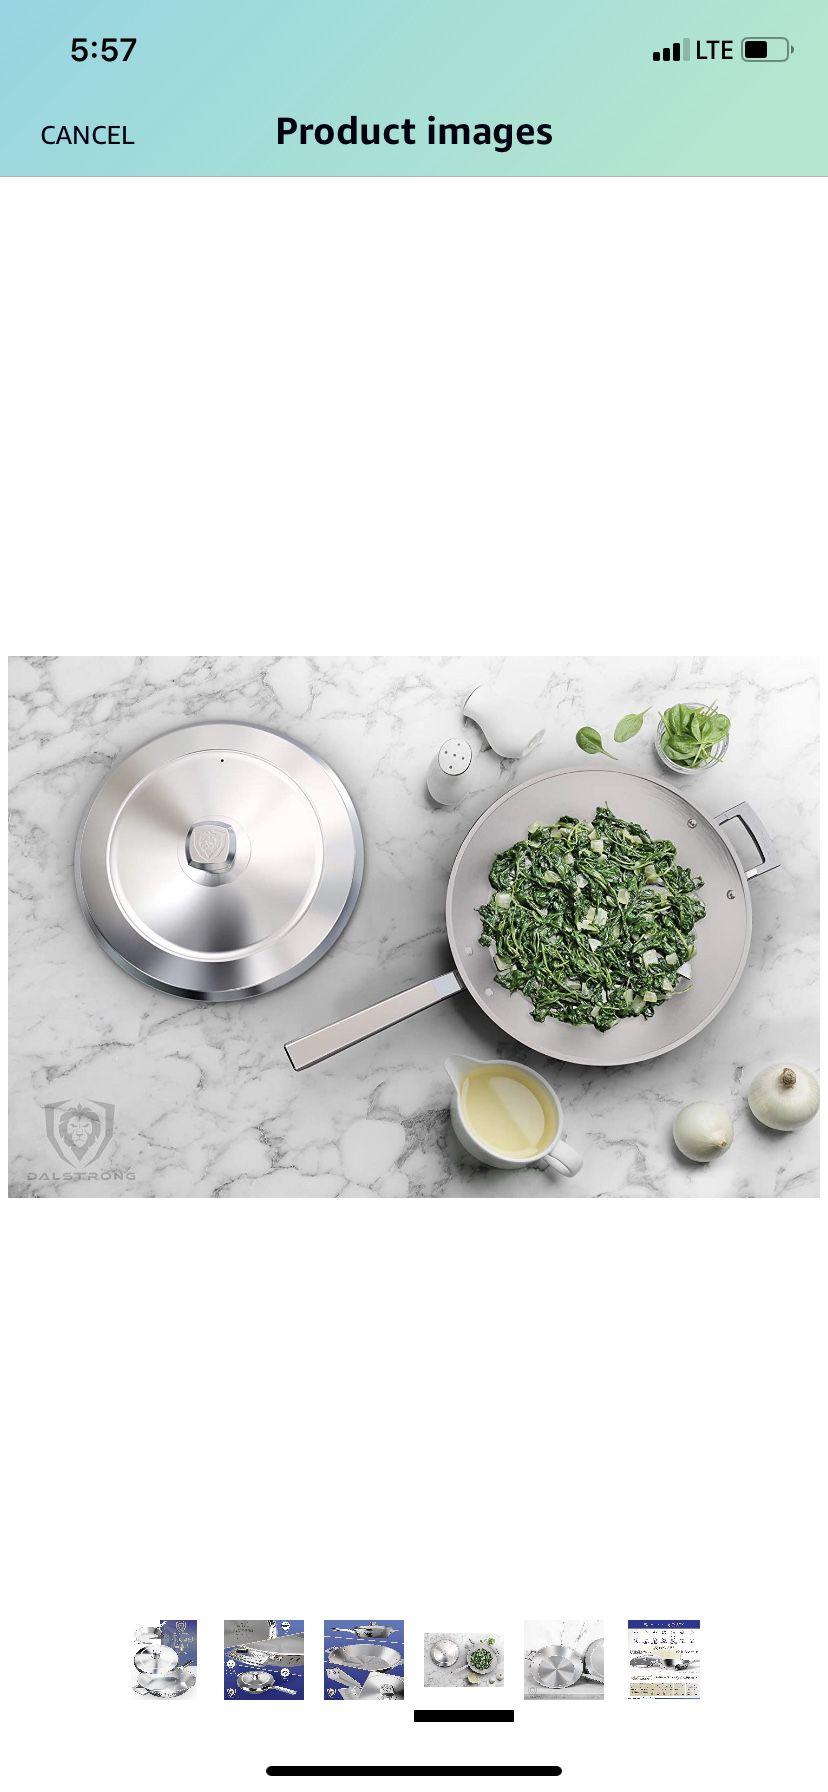 Cookware pan 12 inch